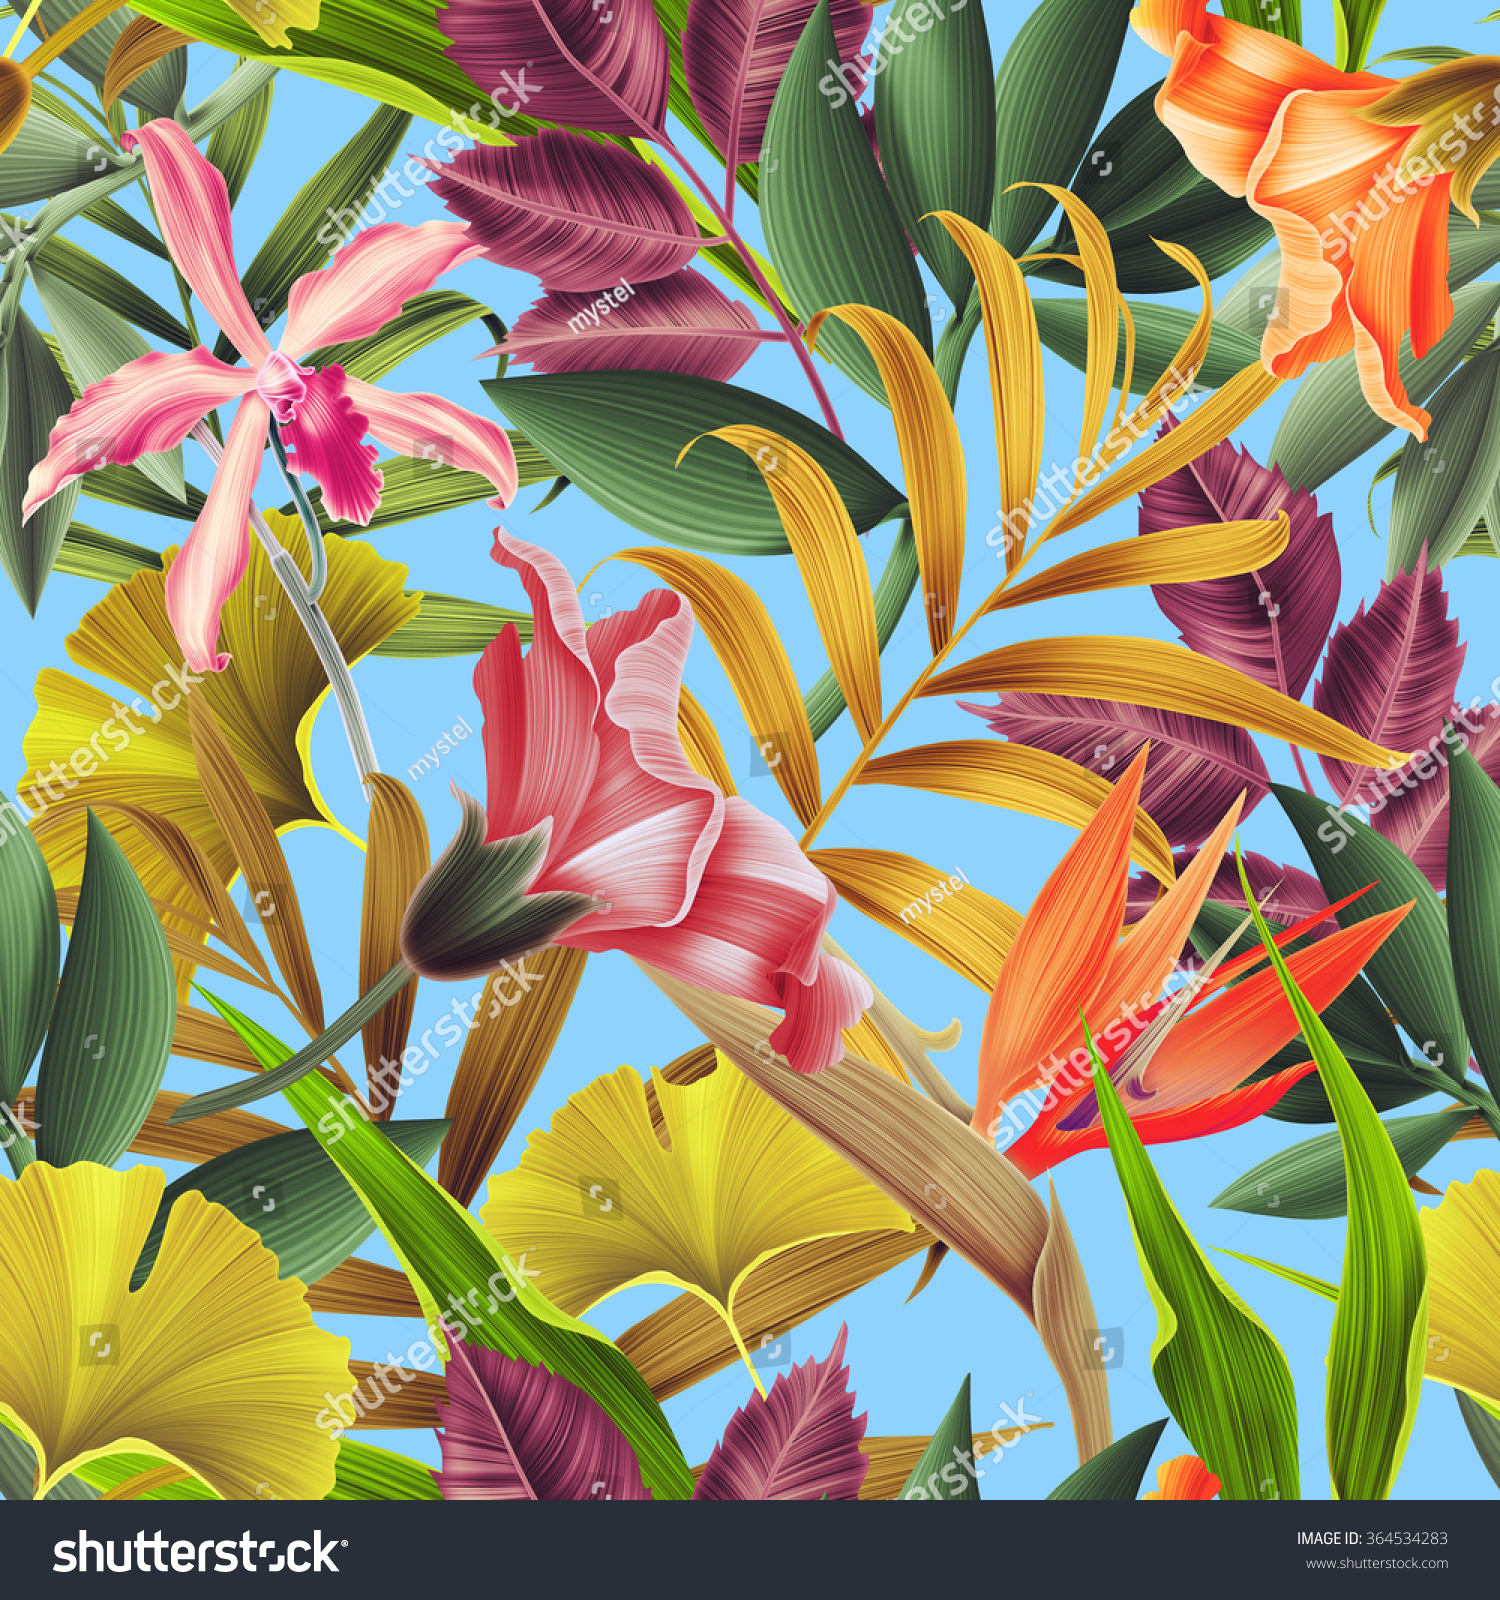 Leaf pattern background retro botanical style stylish flowers print - Seamless Tropical Flower Plant Leaf Pattern Stock